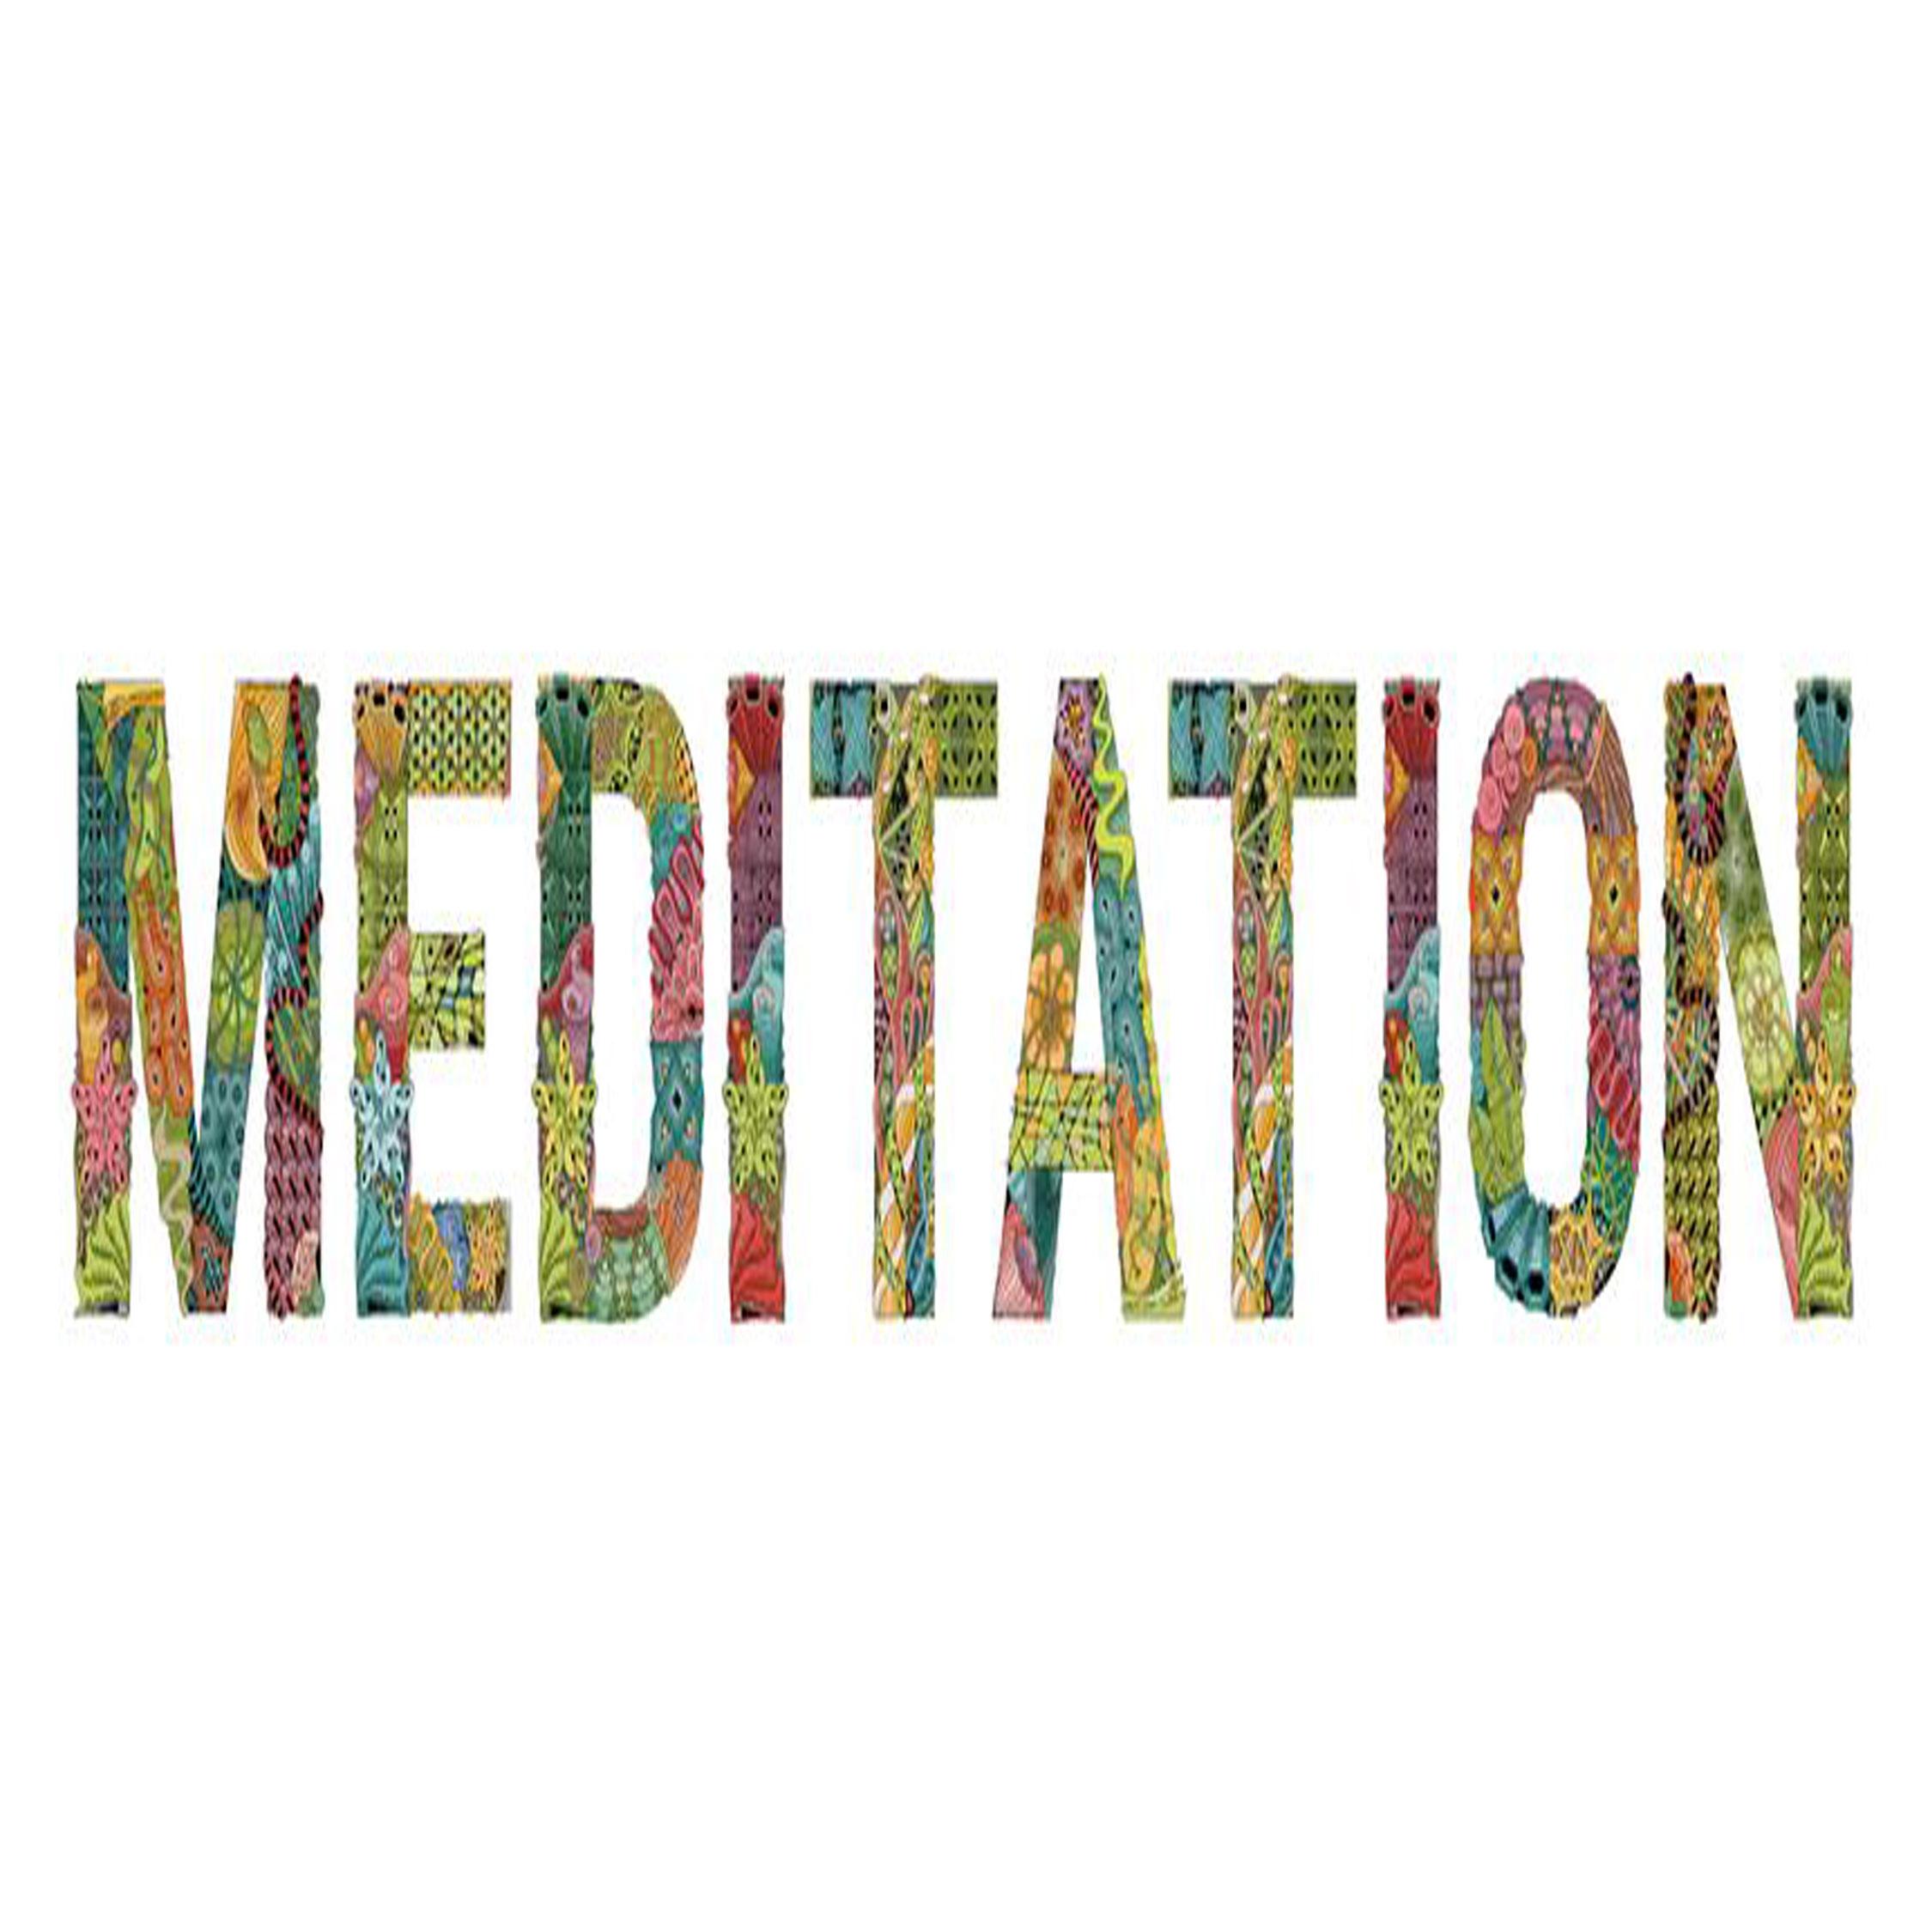 Part 3: How Meditation Helps Mental Health